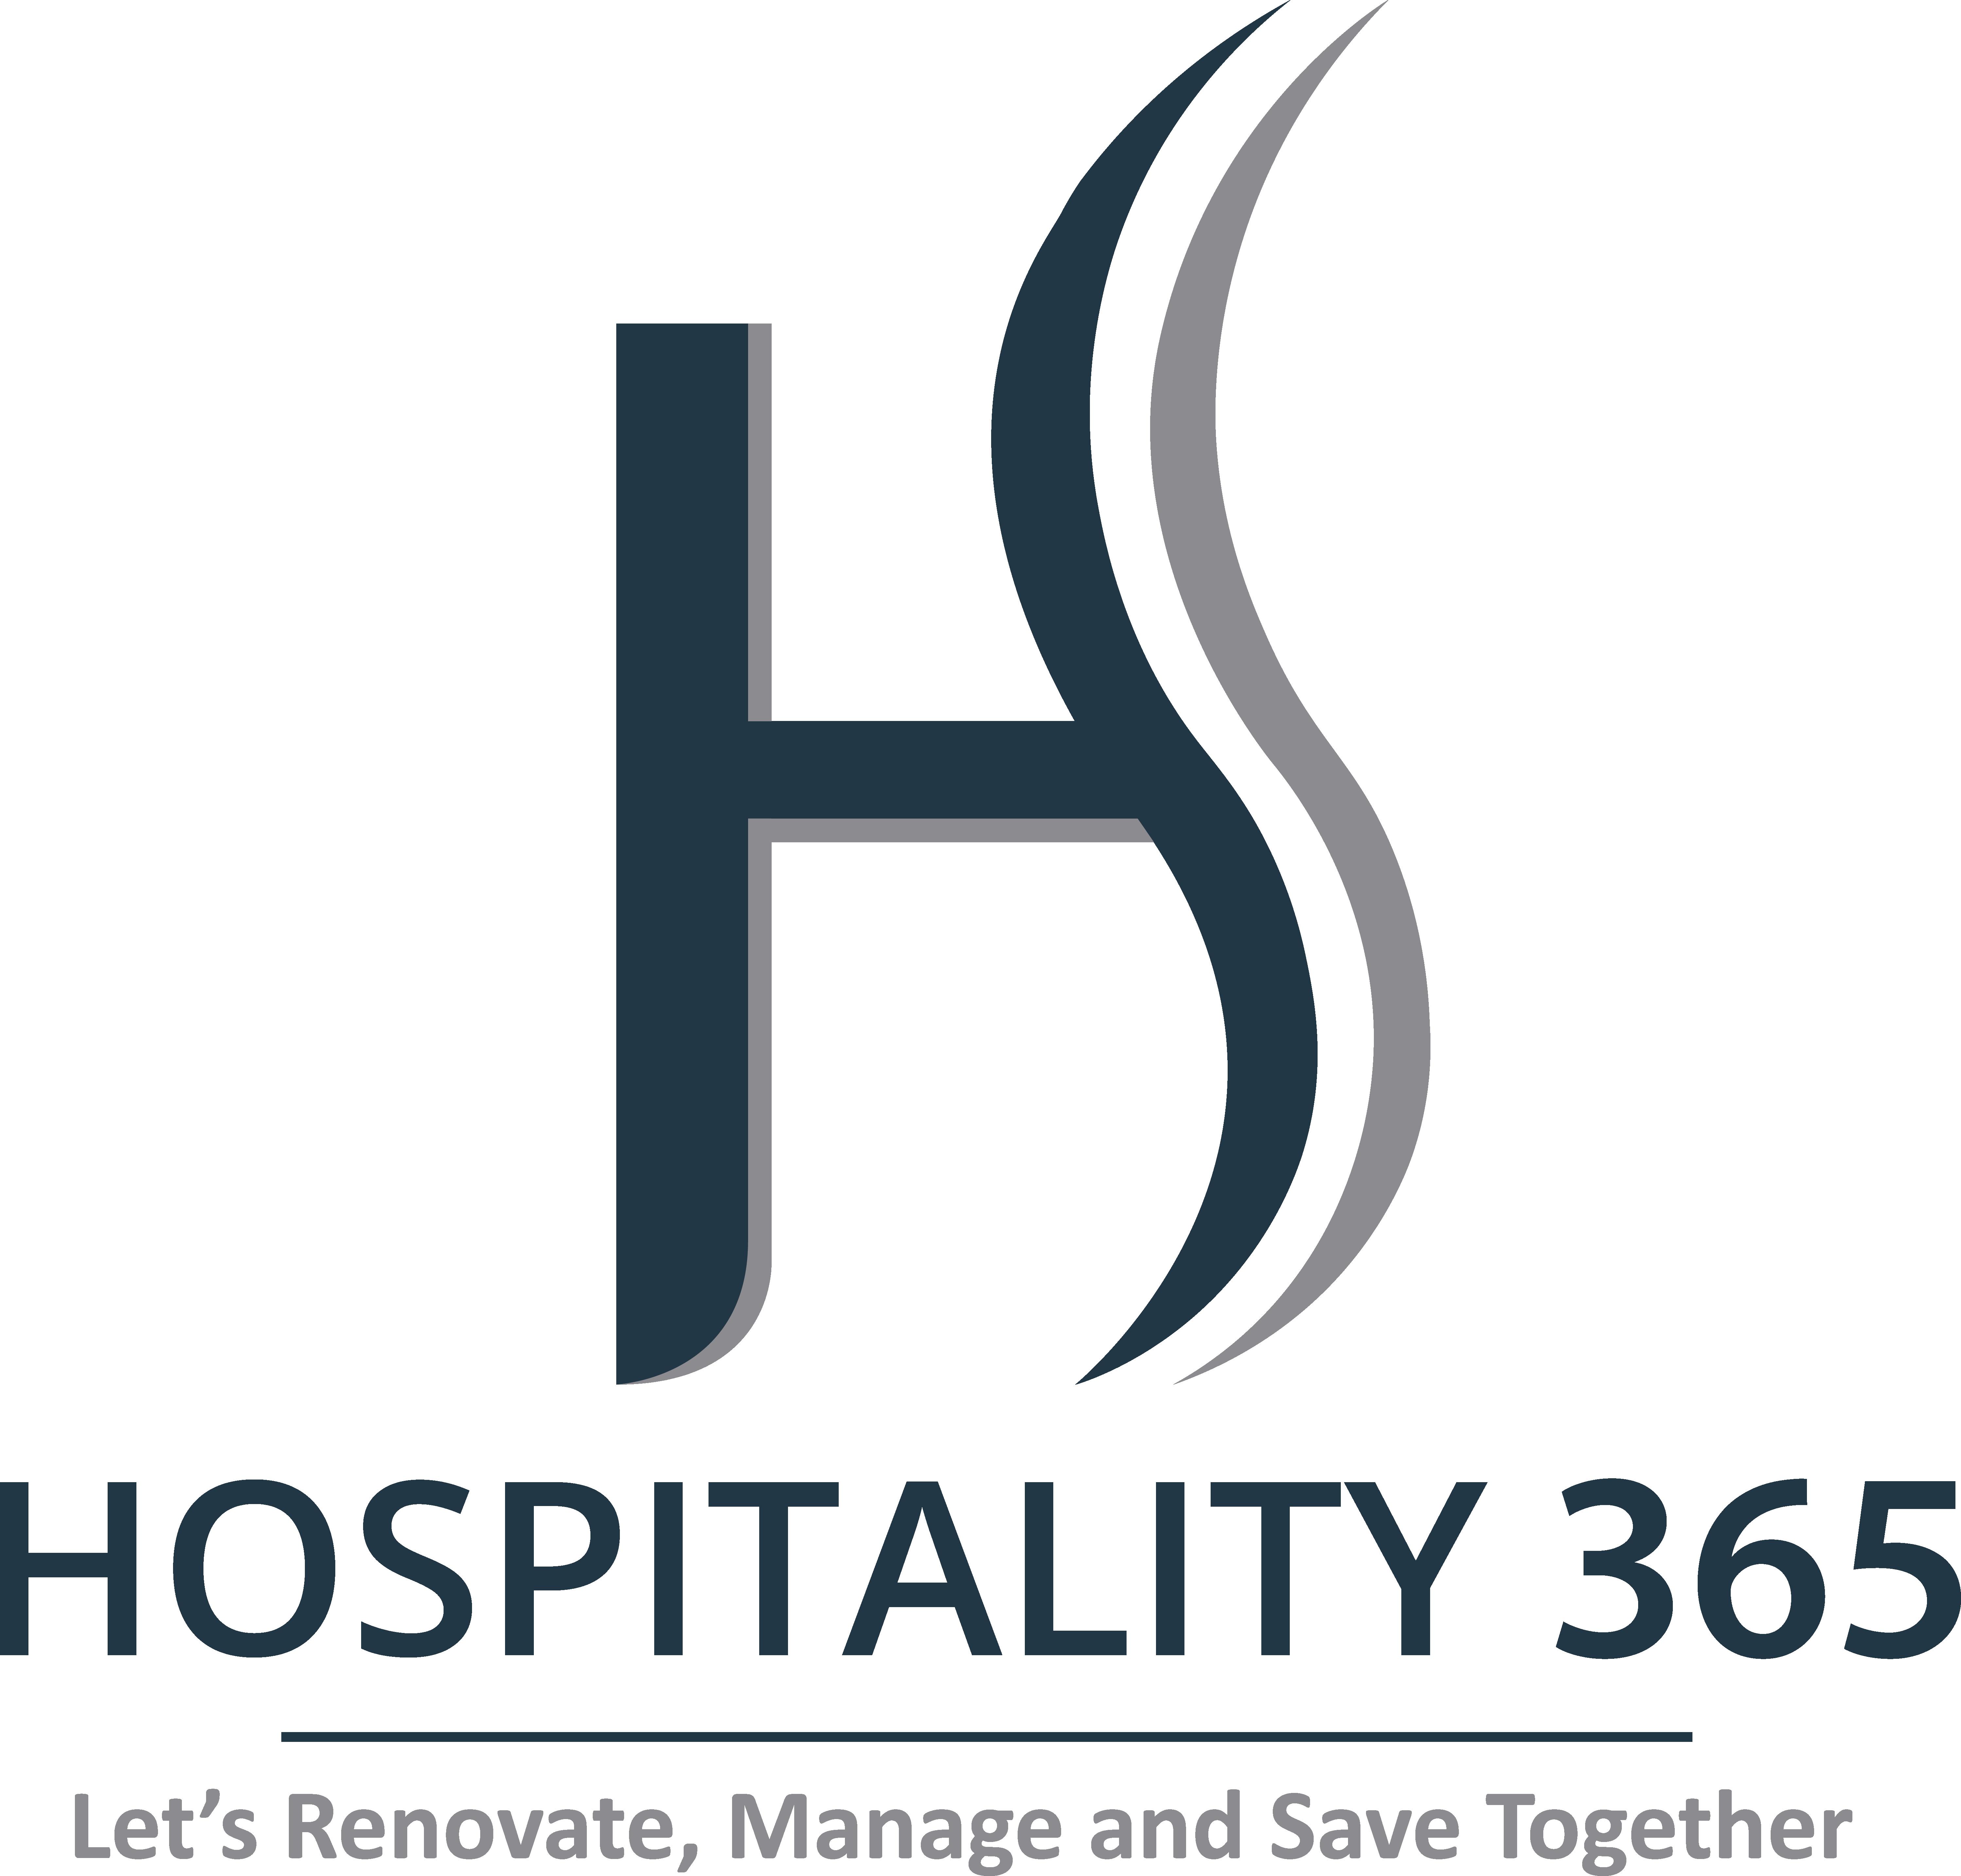 Hospitality365 Logo